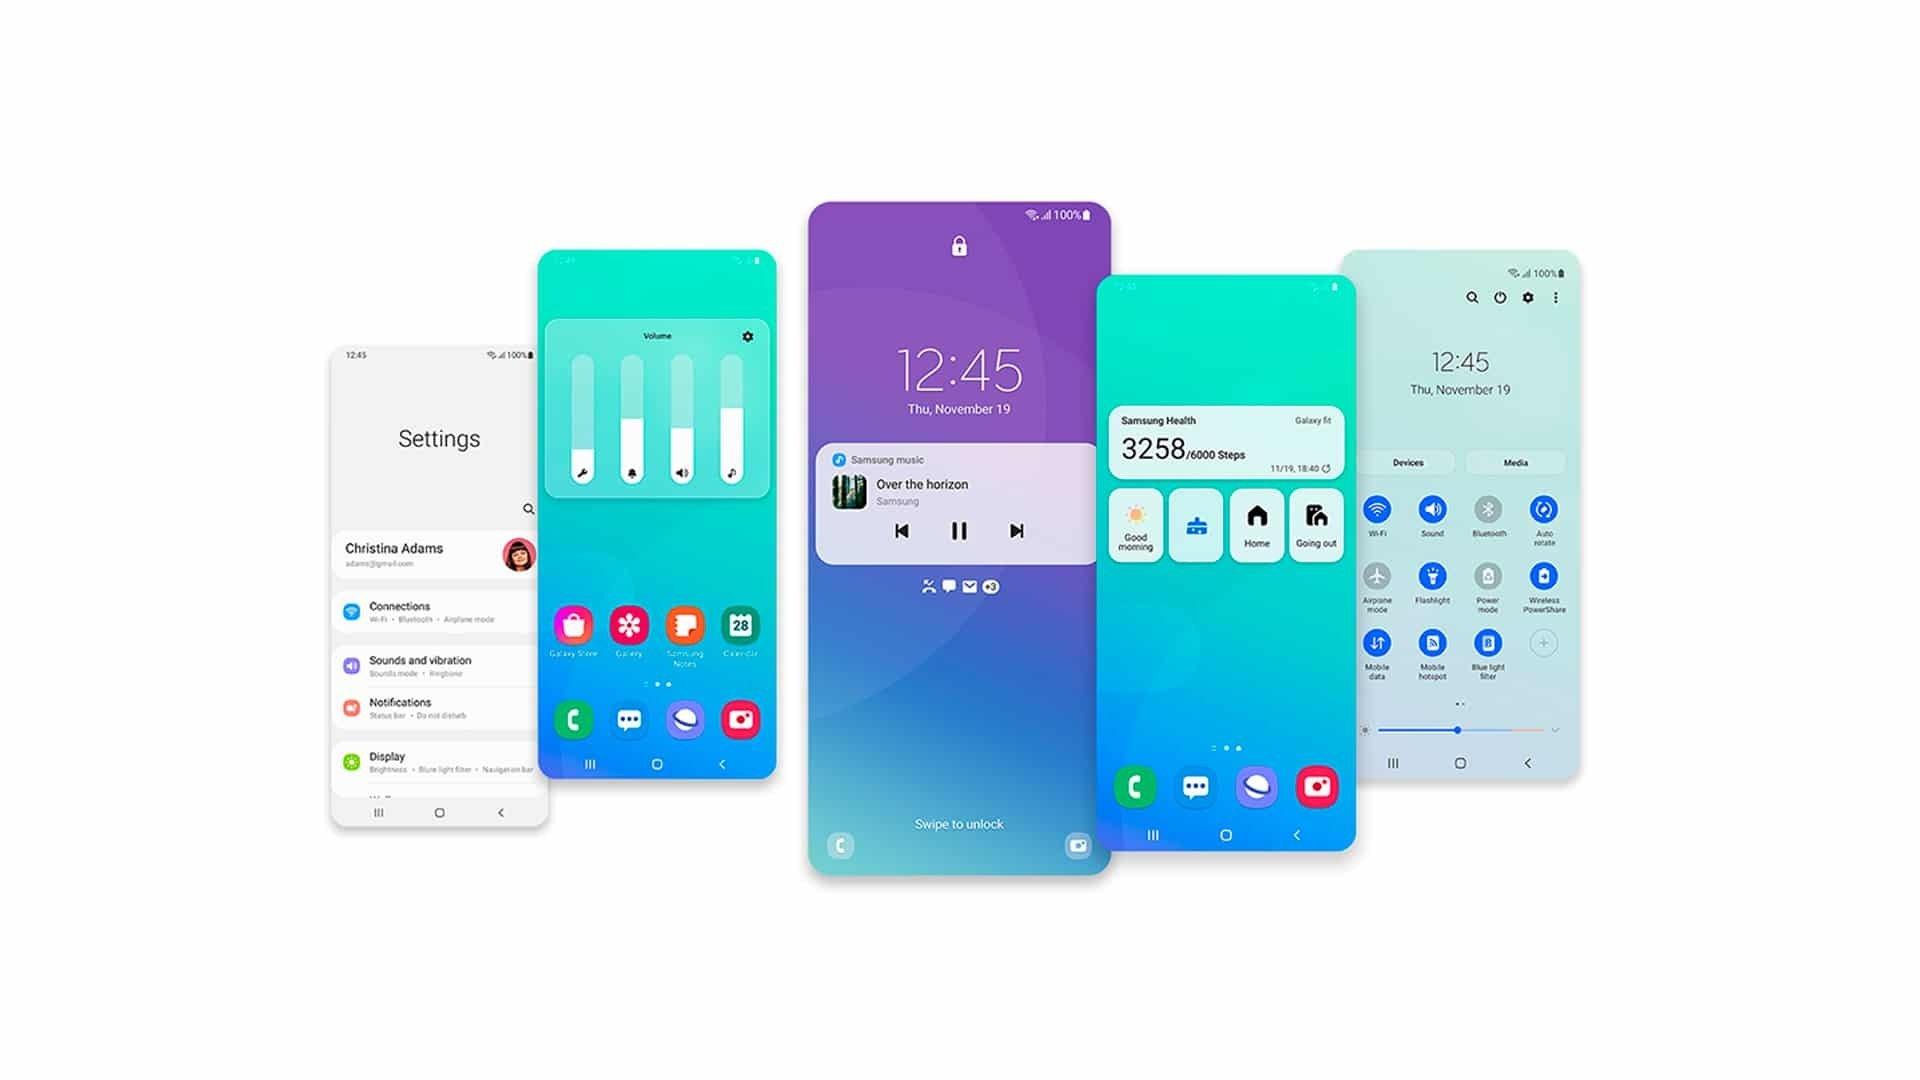 Samsung OneUI 4